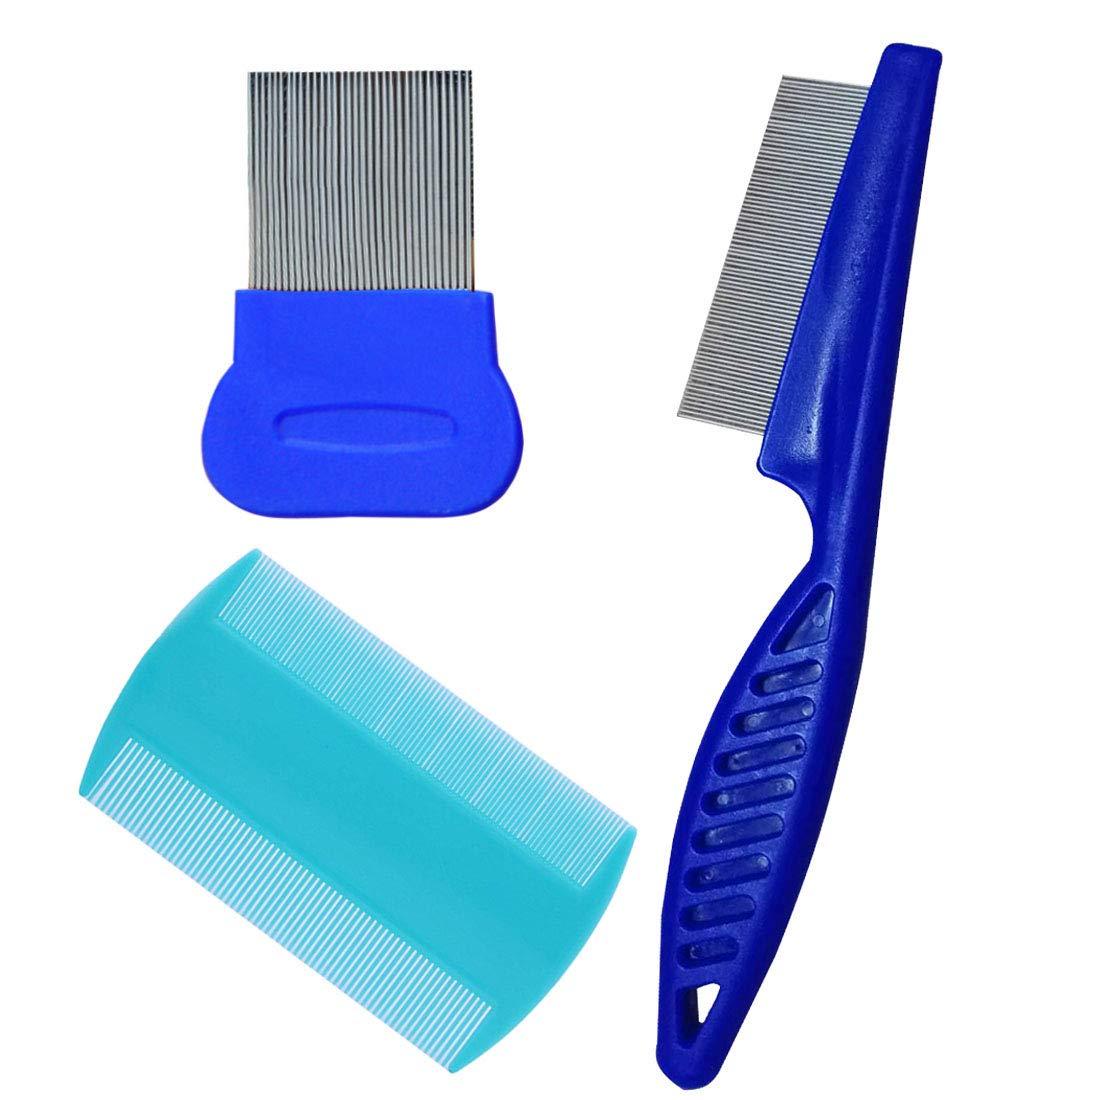 Dog Flea Comb - Comb Loose Hair - Flea Remover for Dogs  Grooming Tick Lice Comb Clean Tool - Flea Remover - 3 Pcs